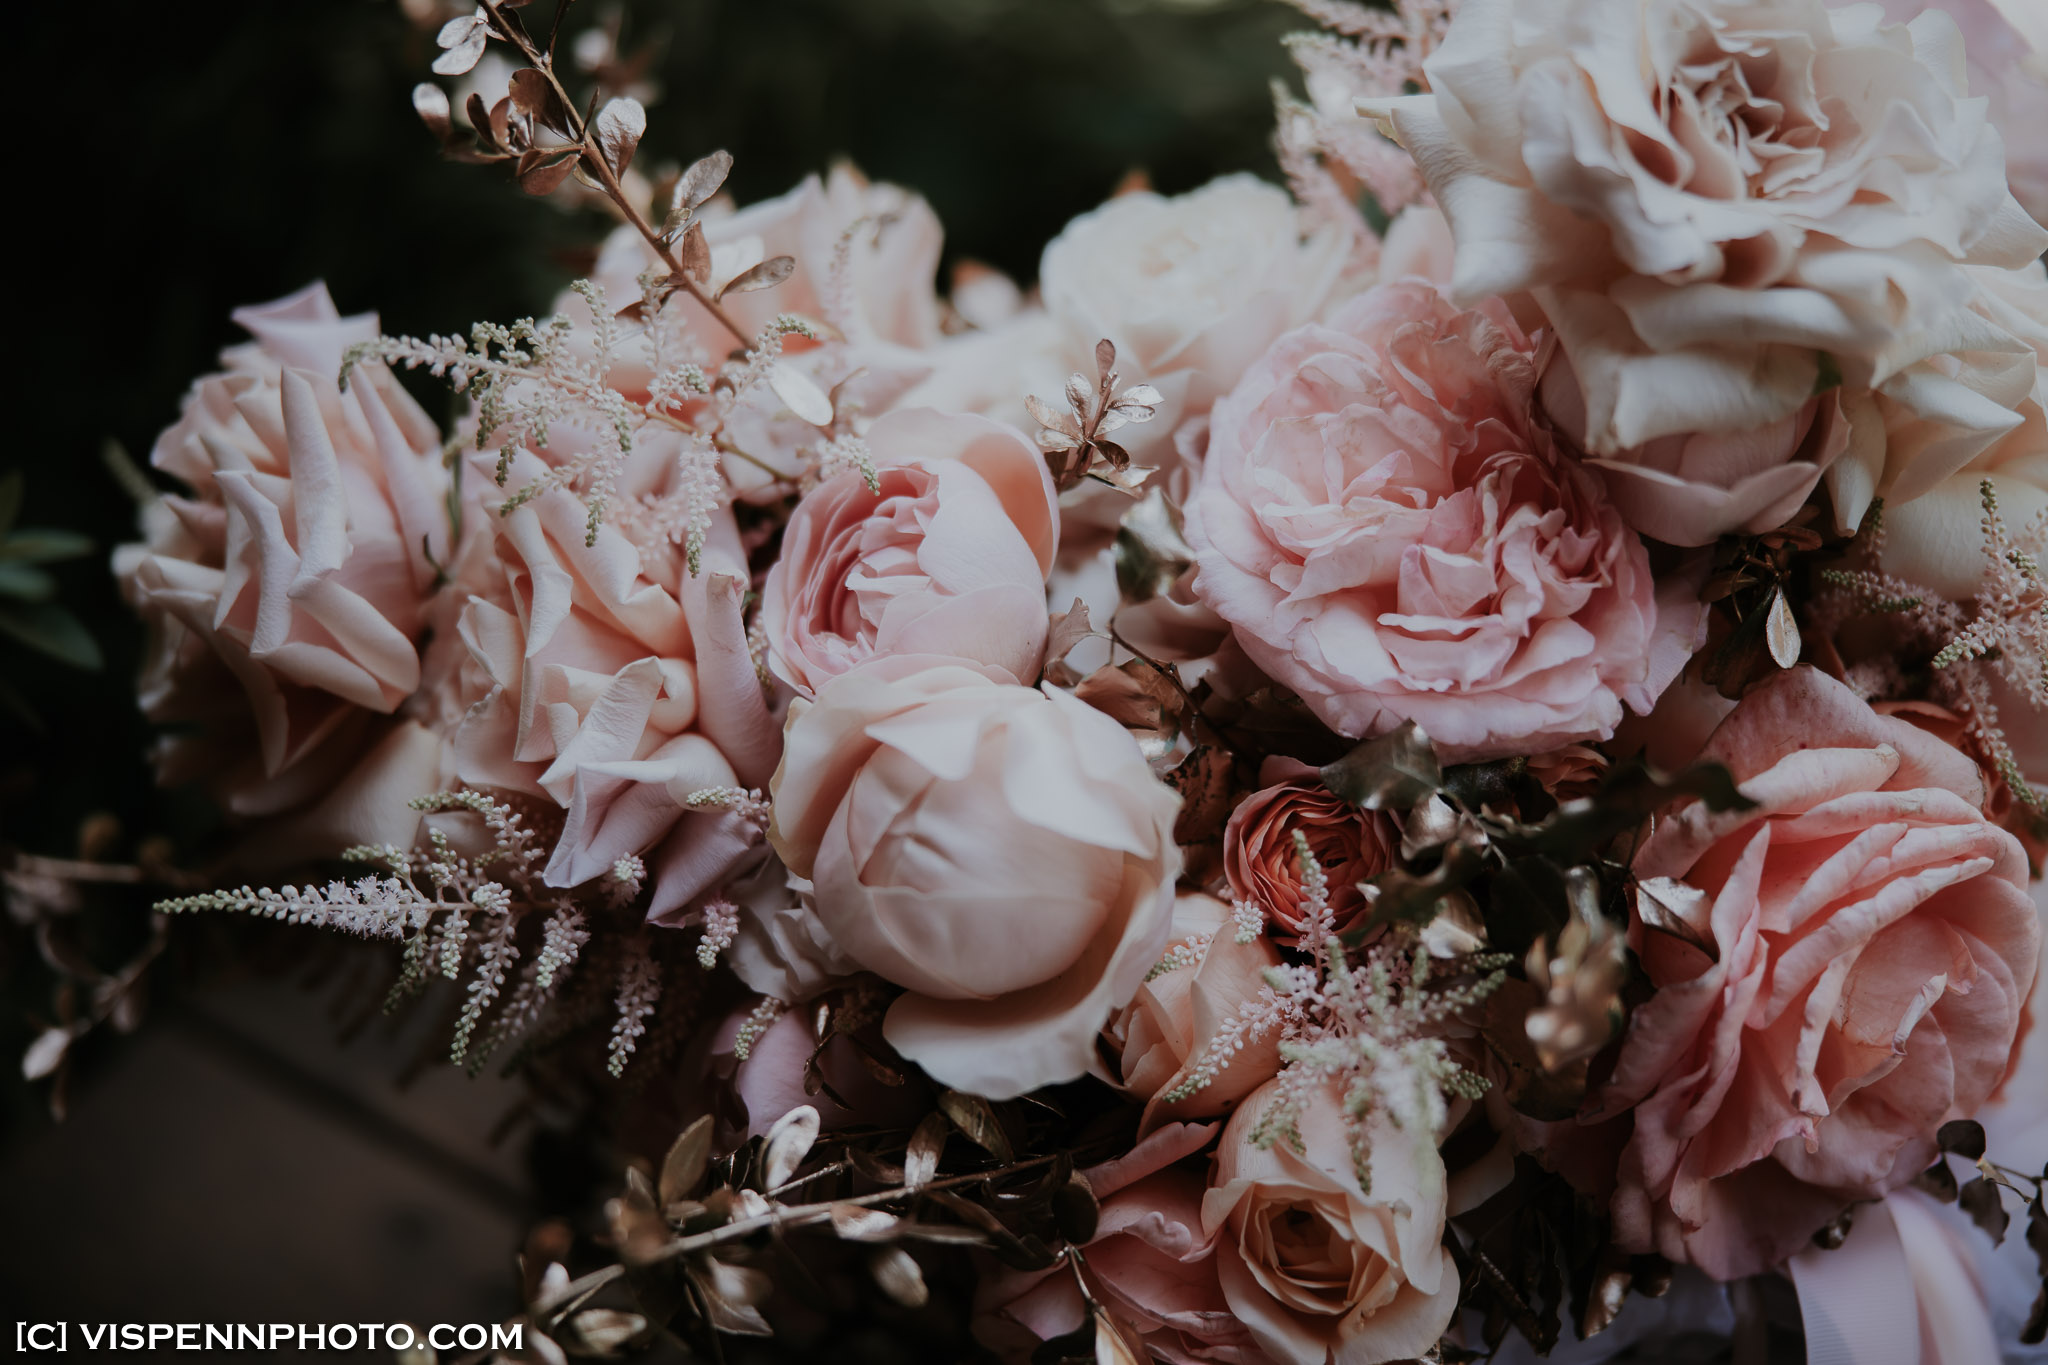 WEDDING DAY Photography Melbourne VISPENN 墨尔本 婚礼跟拍 婚礼摄像 婚礼摄影 结婚照 登记照 ElitaPB 03923 1P EOSR VISPENN